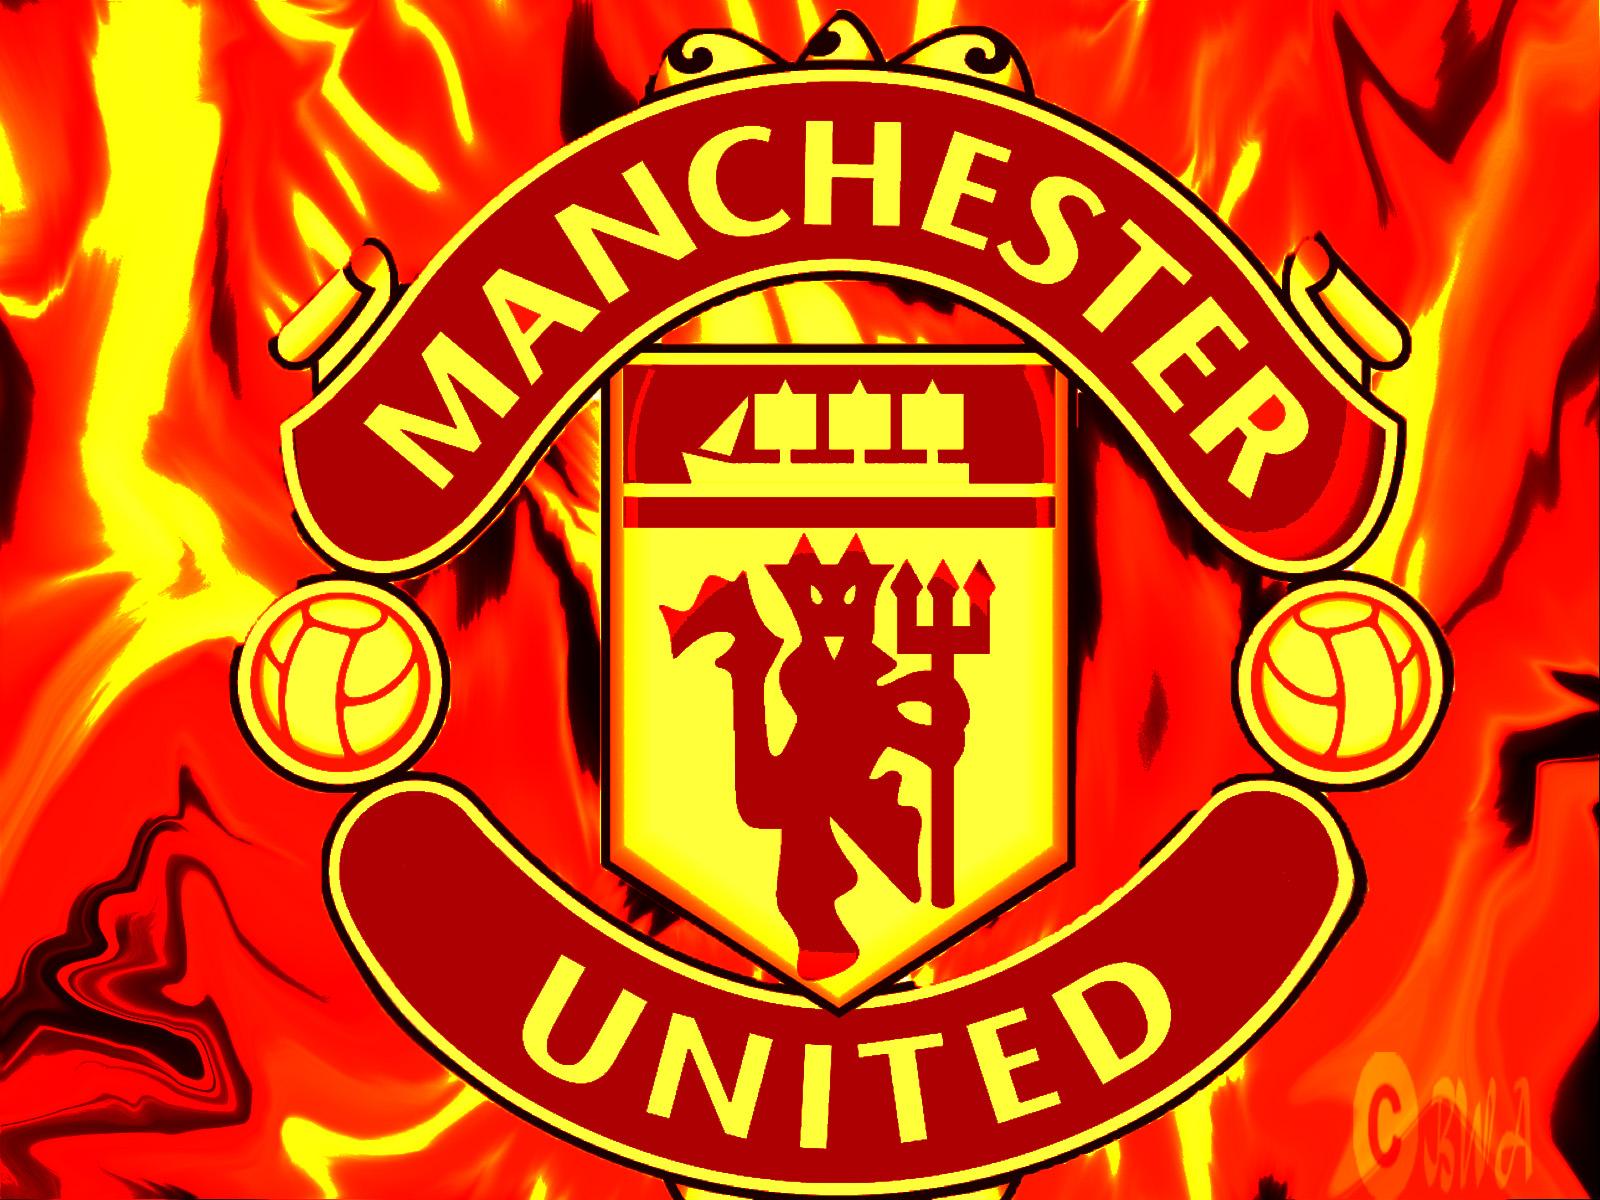 http://1.bp.blogspot.com/-Oc0IknII-E4/TteShwUk5PI/AAAAAAAAA7w/h2pKkbcl4IU/s1600/Manchester_united_Logo_by_banditajj4-wallpaper-art.jpg